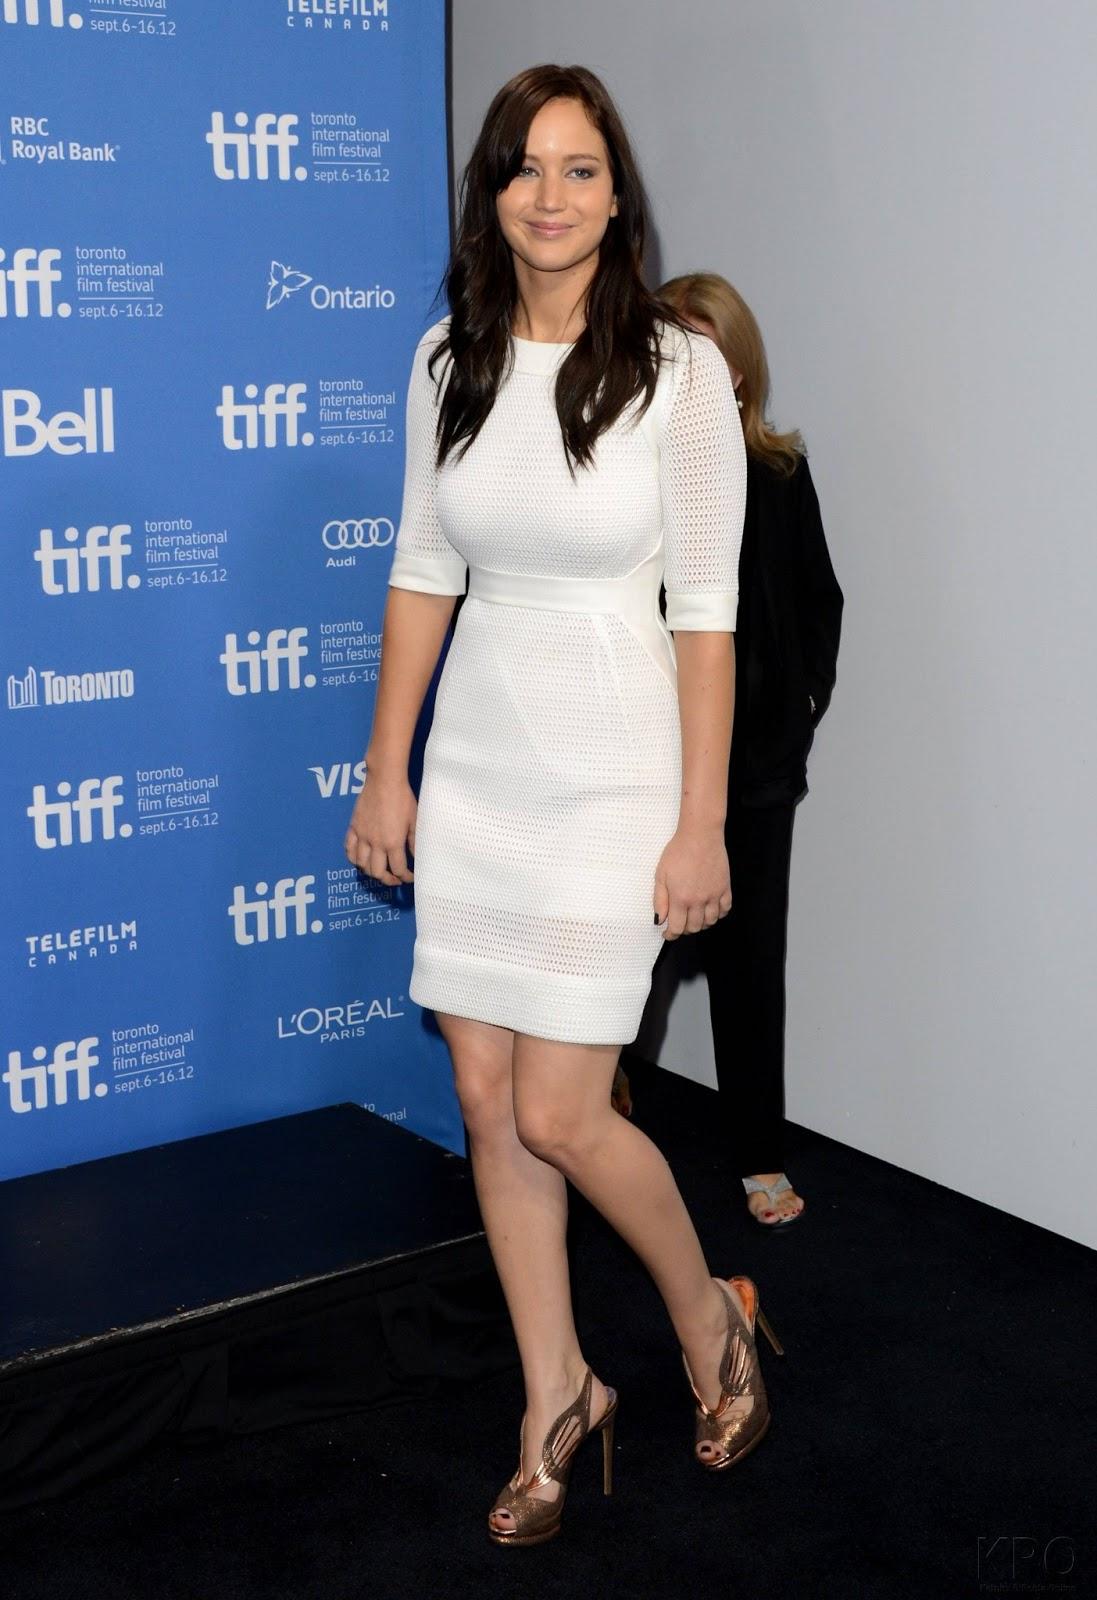 Jennifer Lawrence Legs,jennifer Lawrence Hot Legs,jennifer Lawrence